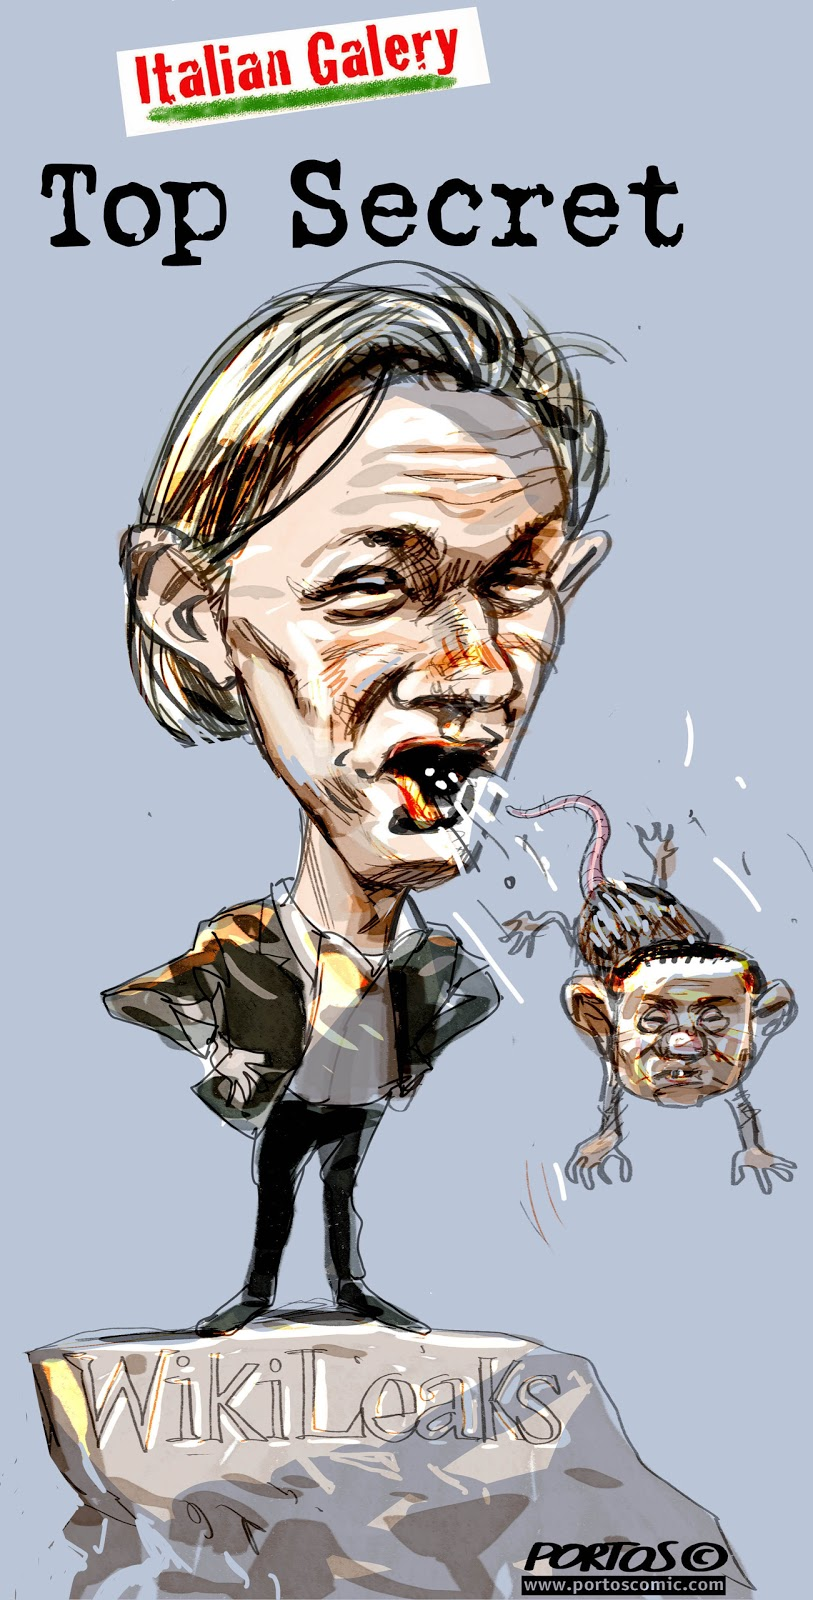 http://1.bp.blogspot.com/_VEjt2c4CQYQ/TPu8v2MU7OI/AAAAAAAAB2Y/I910KpH0CGE/s1600/ApMo+Assange%252B.jpg